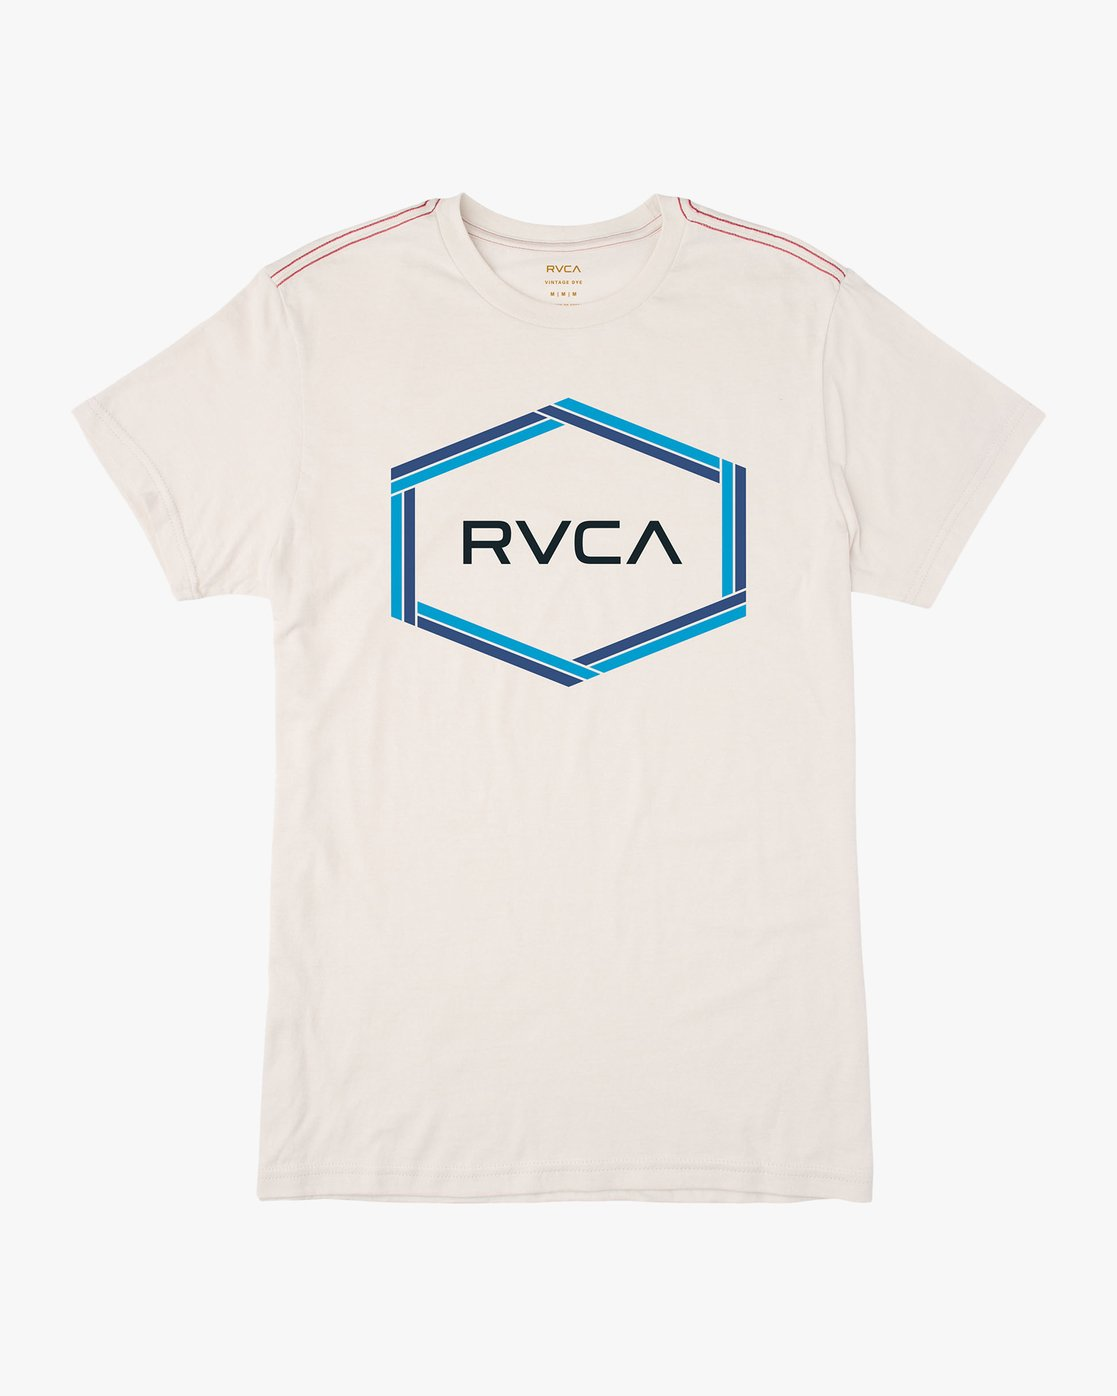 0 Hexest T-Shirt White M420QRHX RVCA